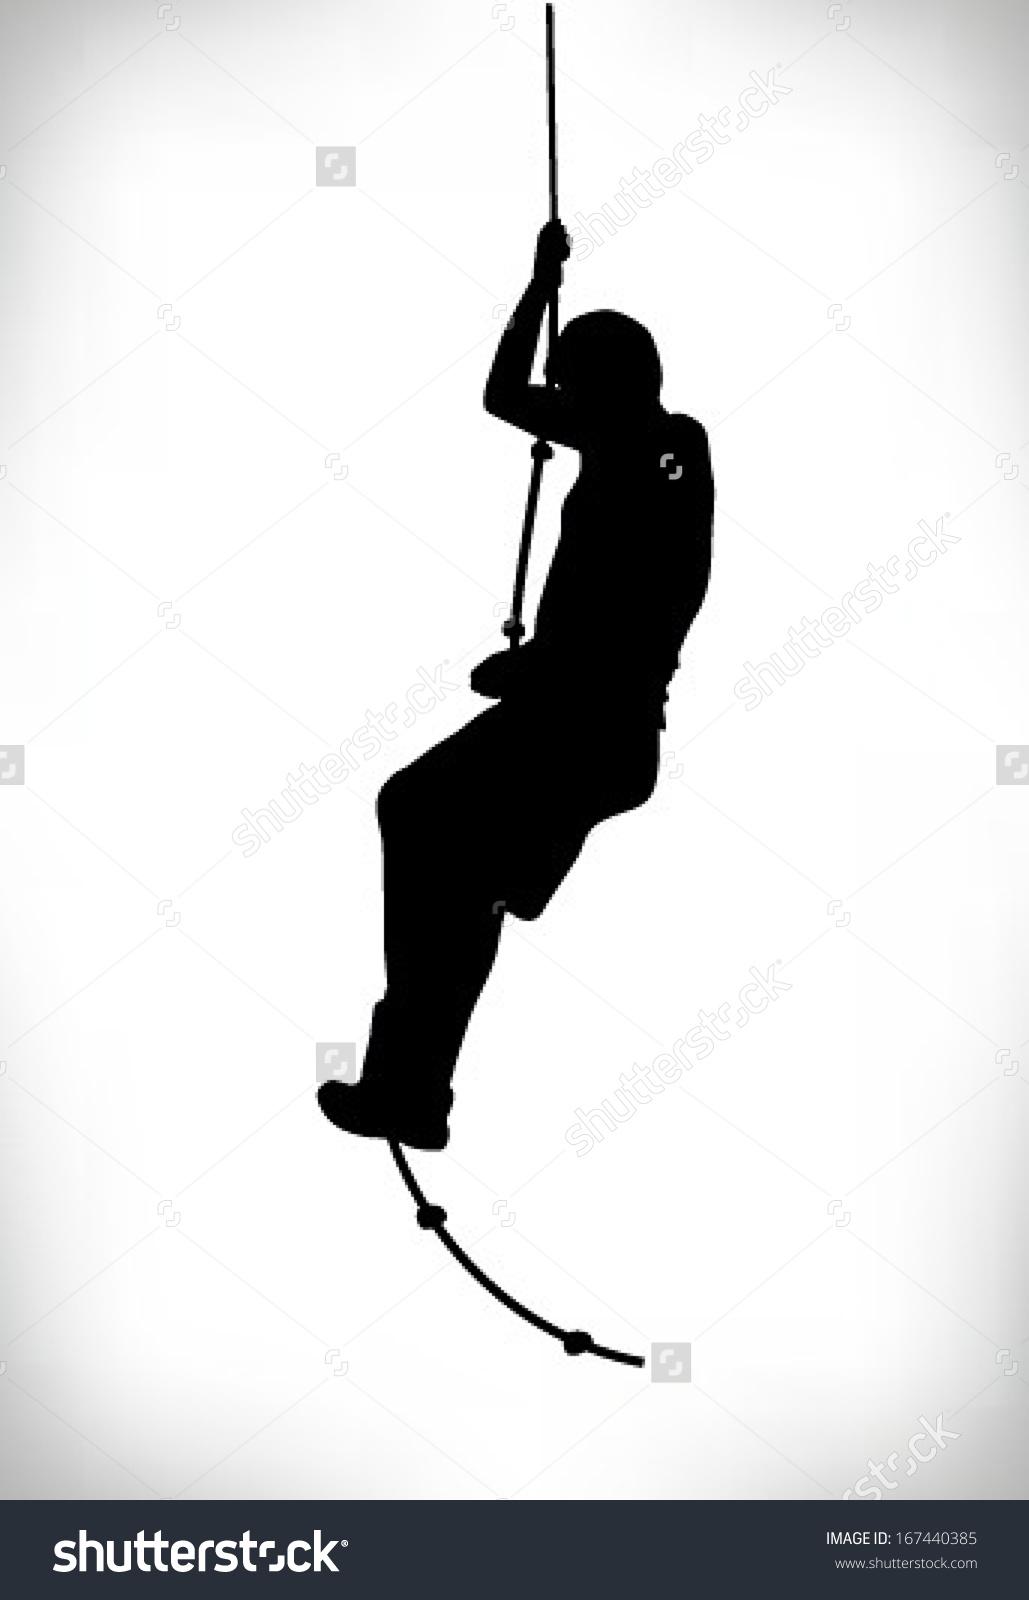 Silhouette Man Climbing Rope Stock Vector 167440385.